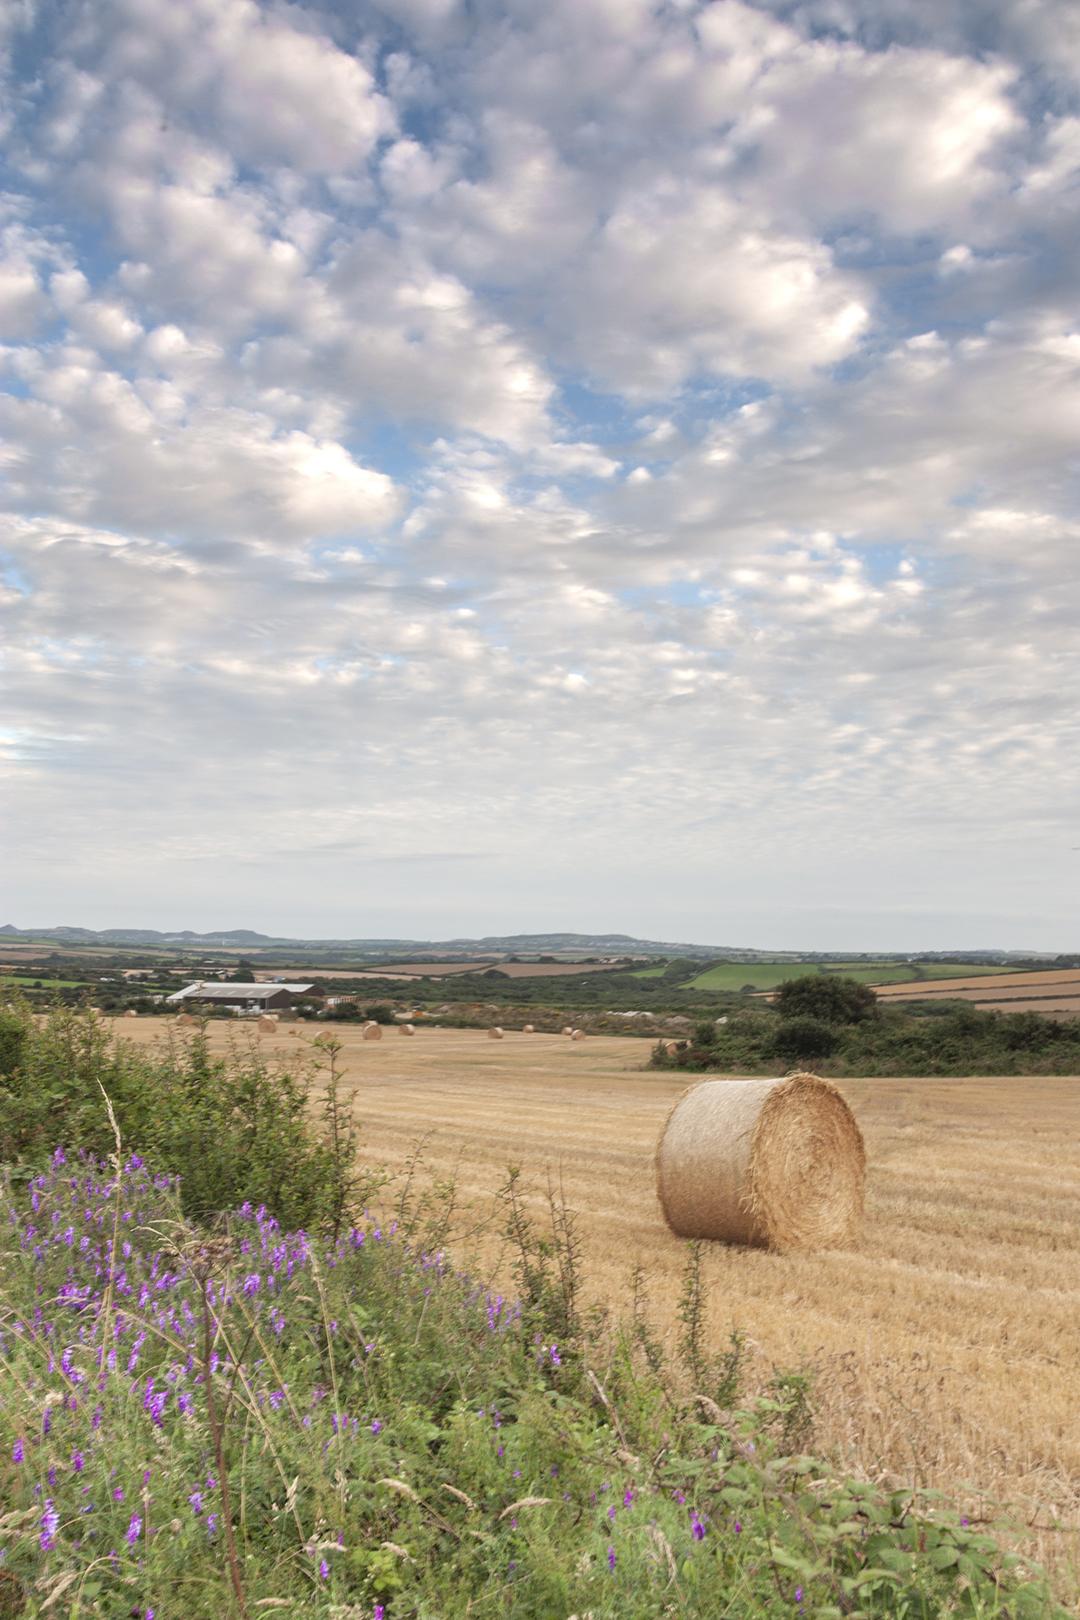 cornwall wheat field.jpg